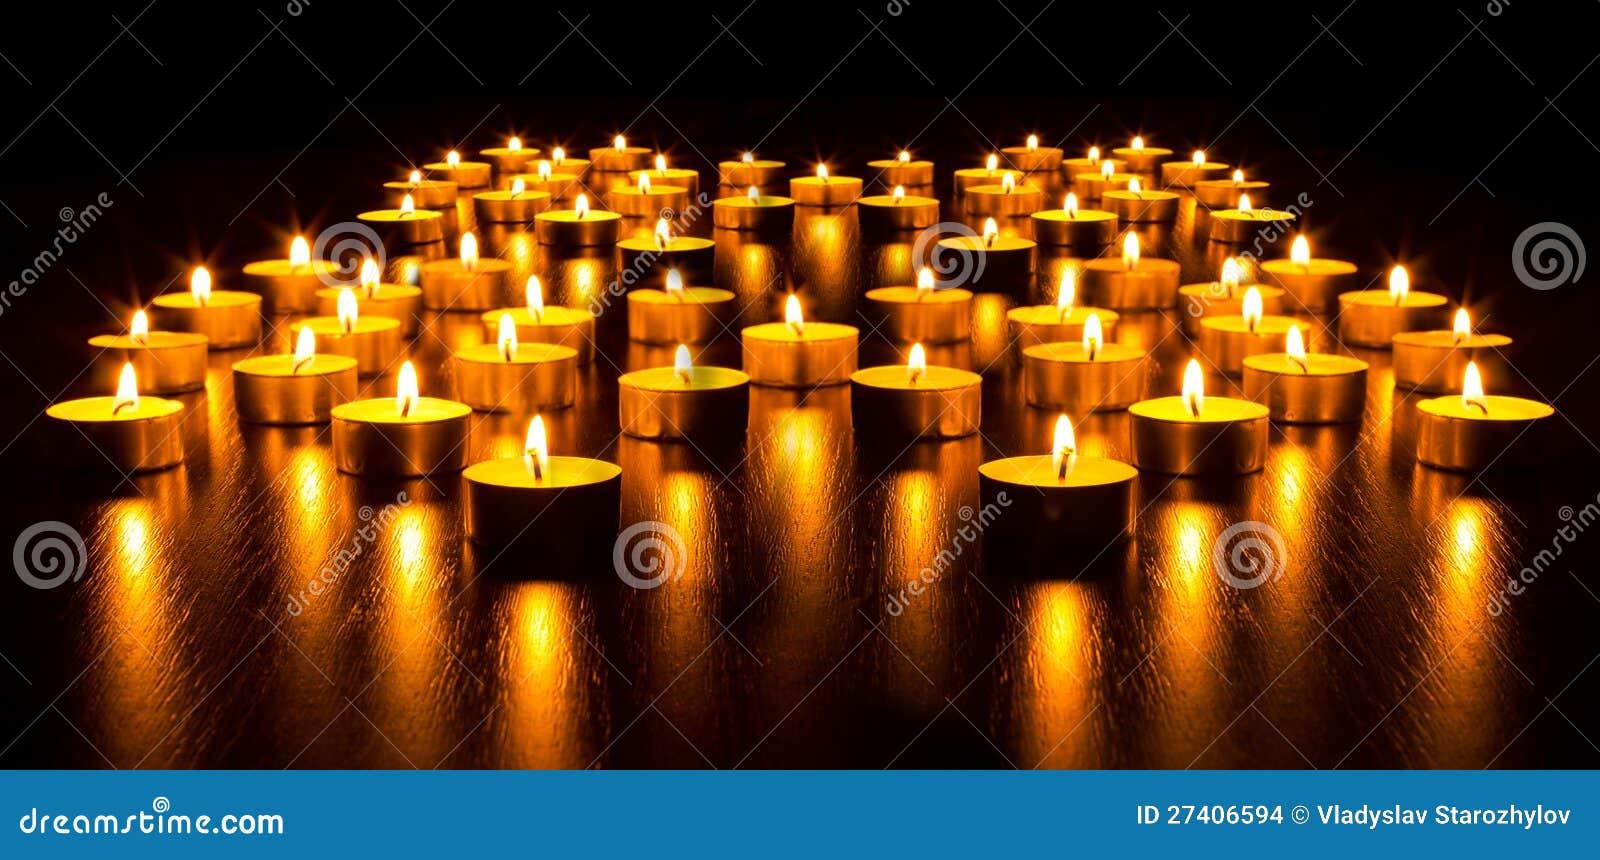 Panorama dei molti candele brucianti